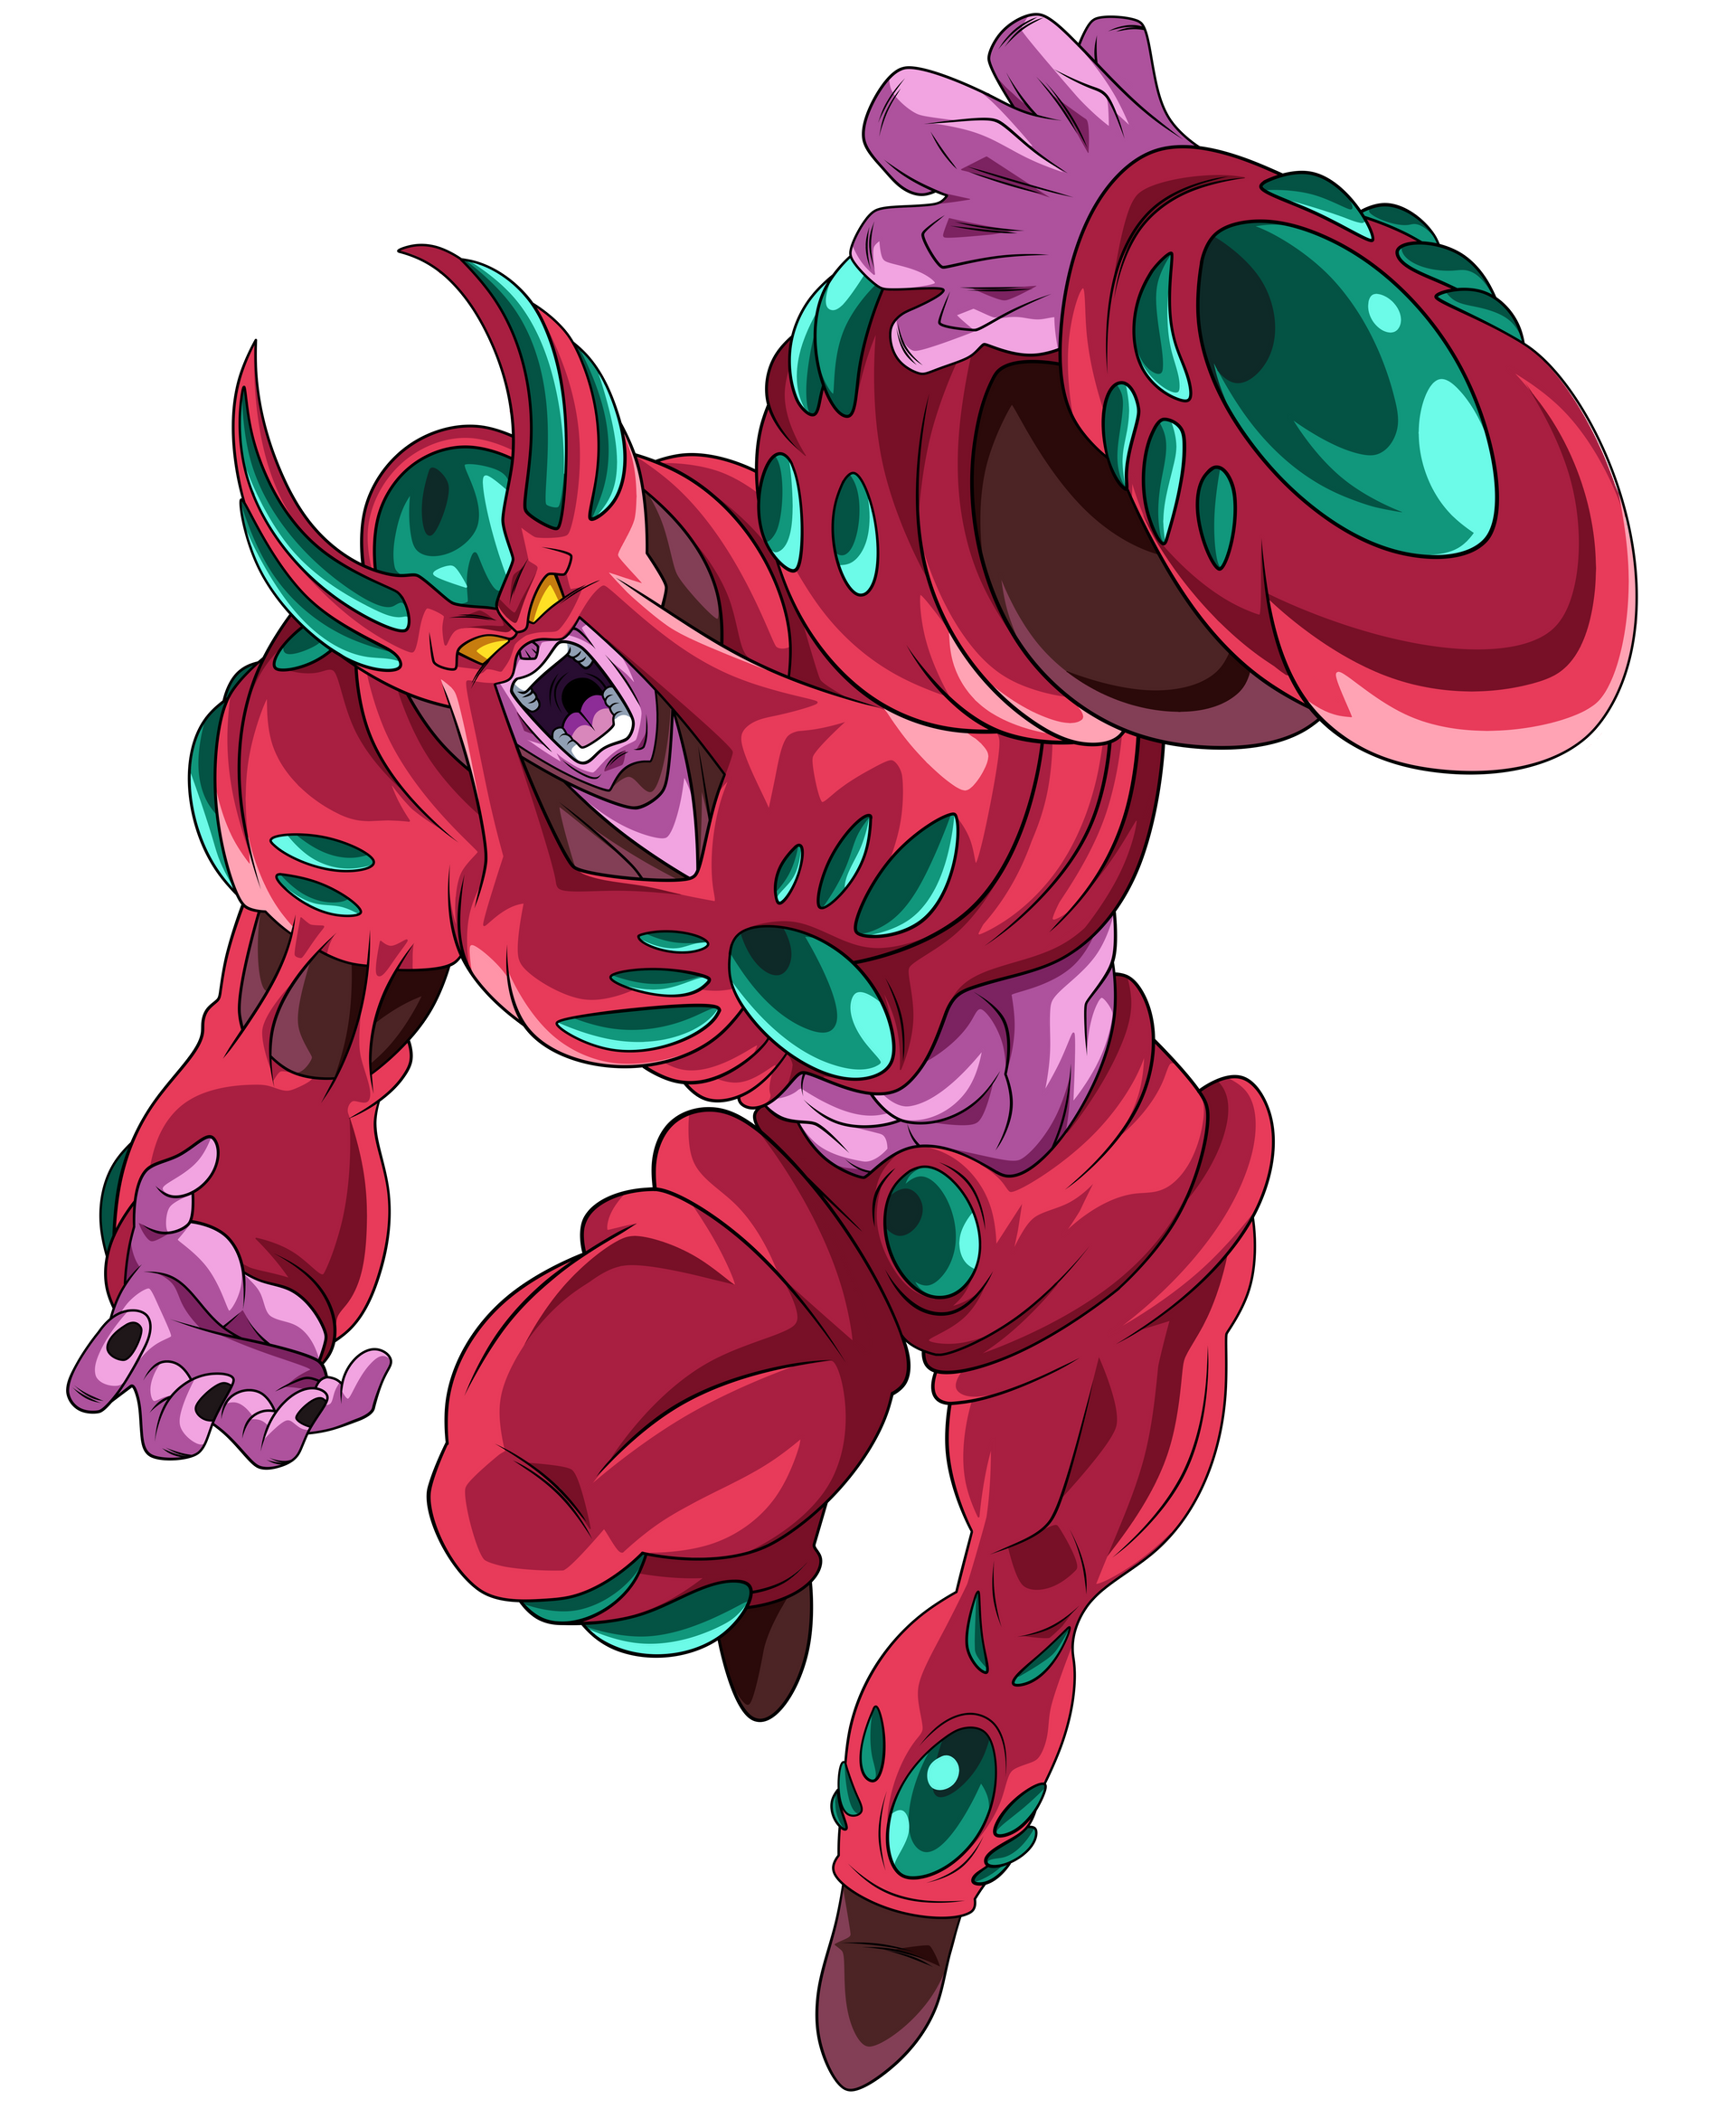 Hatchiyack Evolucionado Render 1 By Ssjrose890 On Deviantart Dragon Ball Image Dragon Ball Artwork Dragon Ball Art